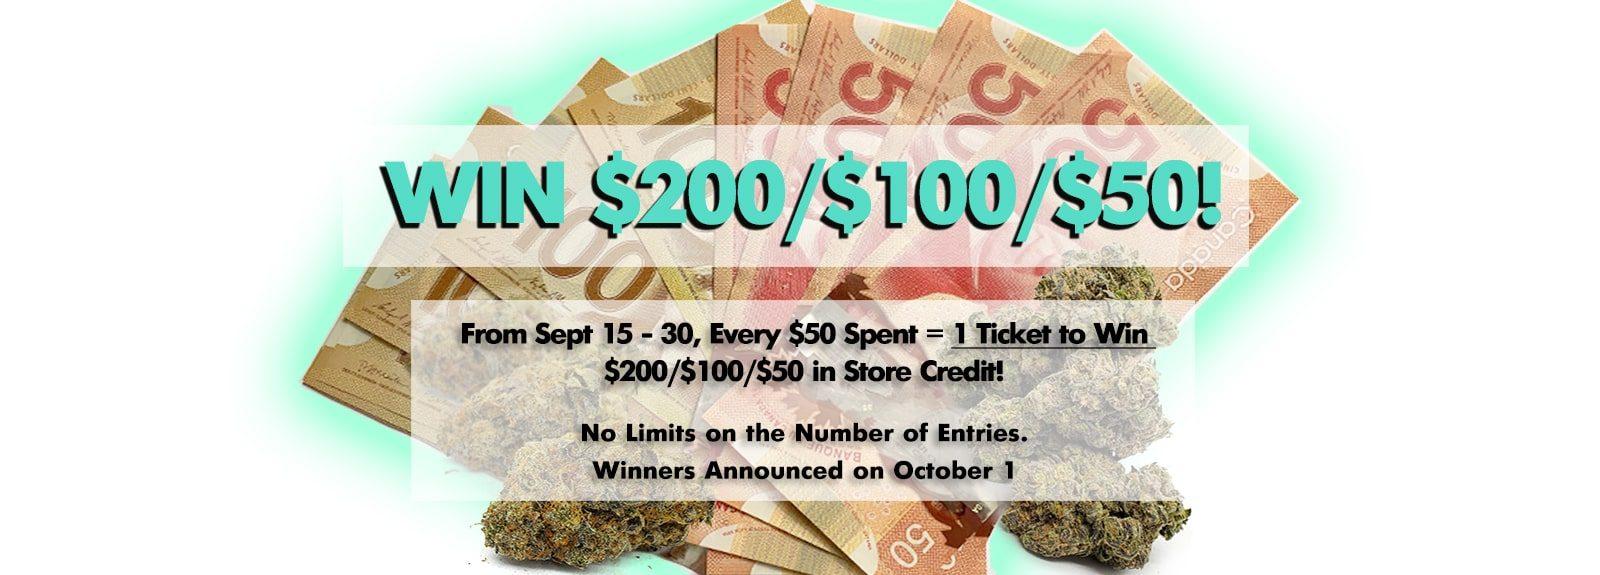 giveaway-dealspage3